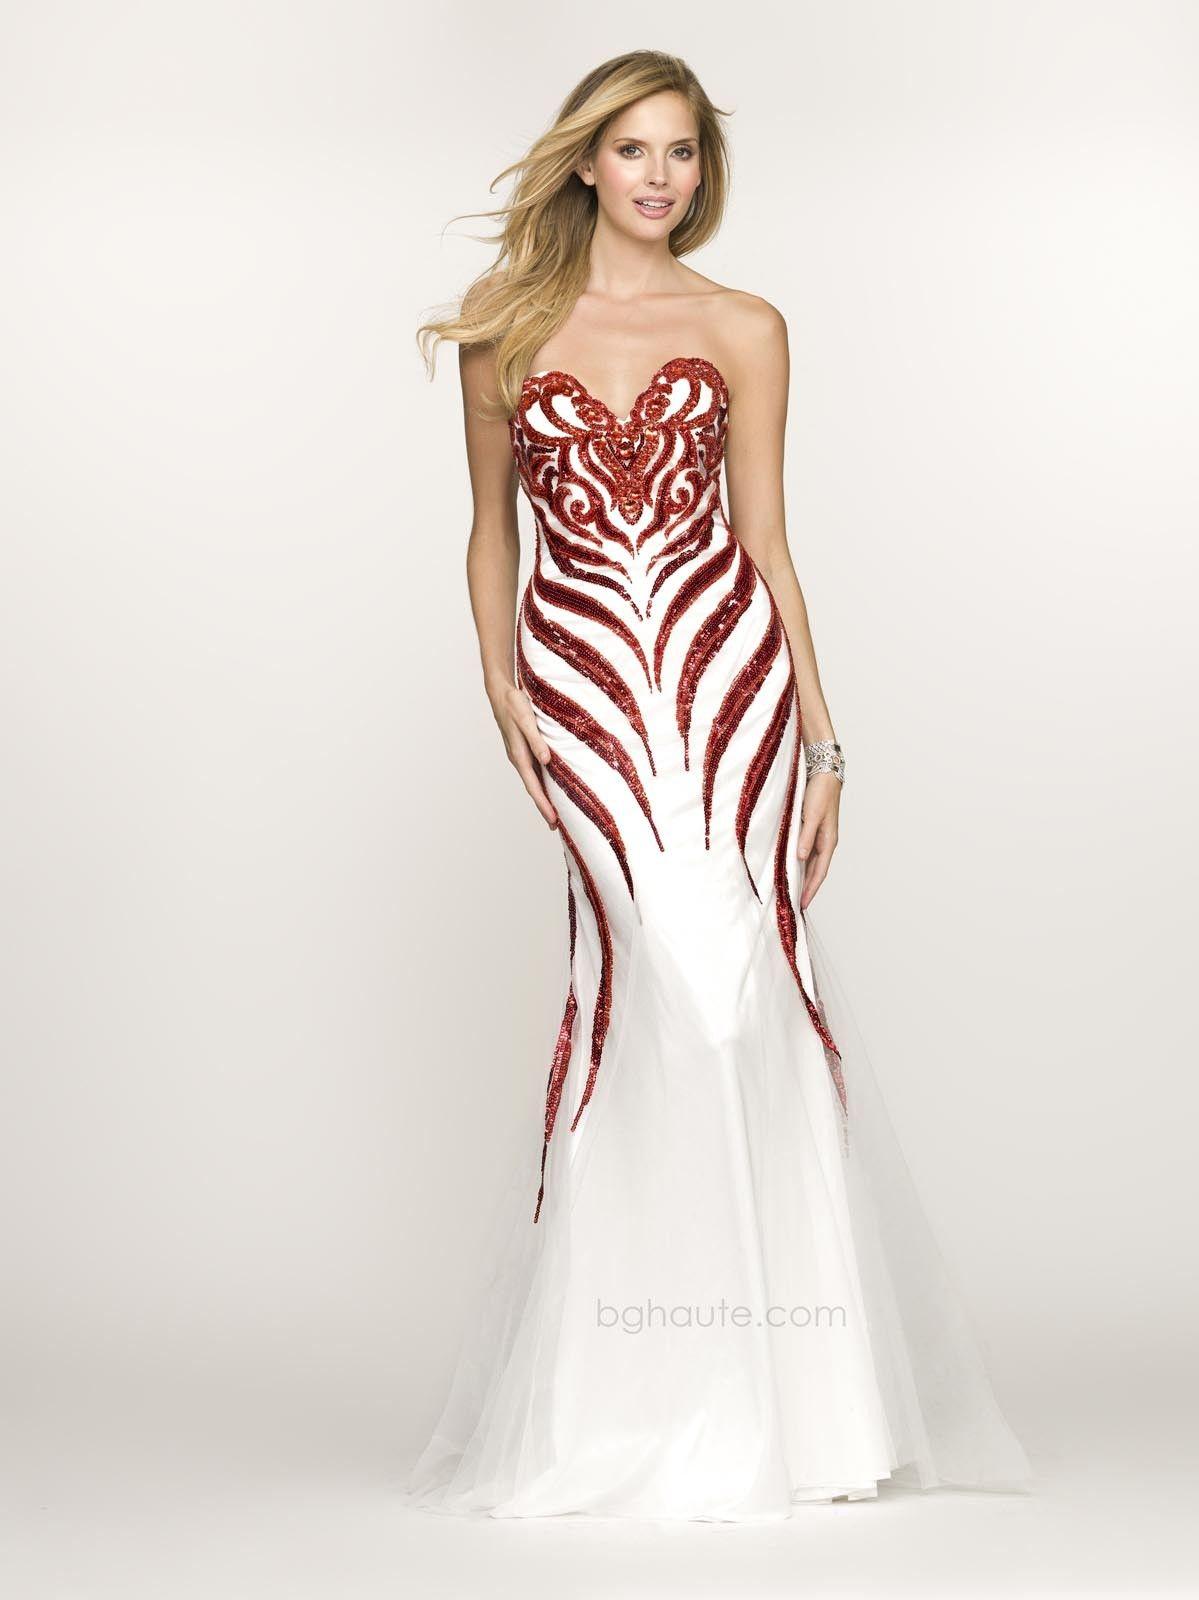 Bg haute g bejeweled mermaid whitered prom dress picture